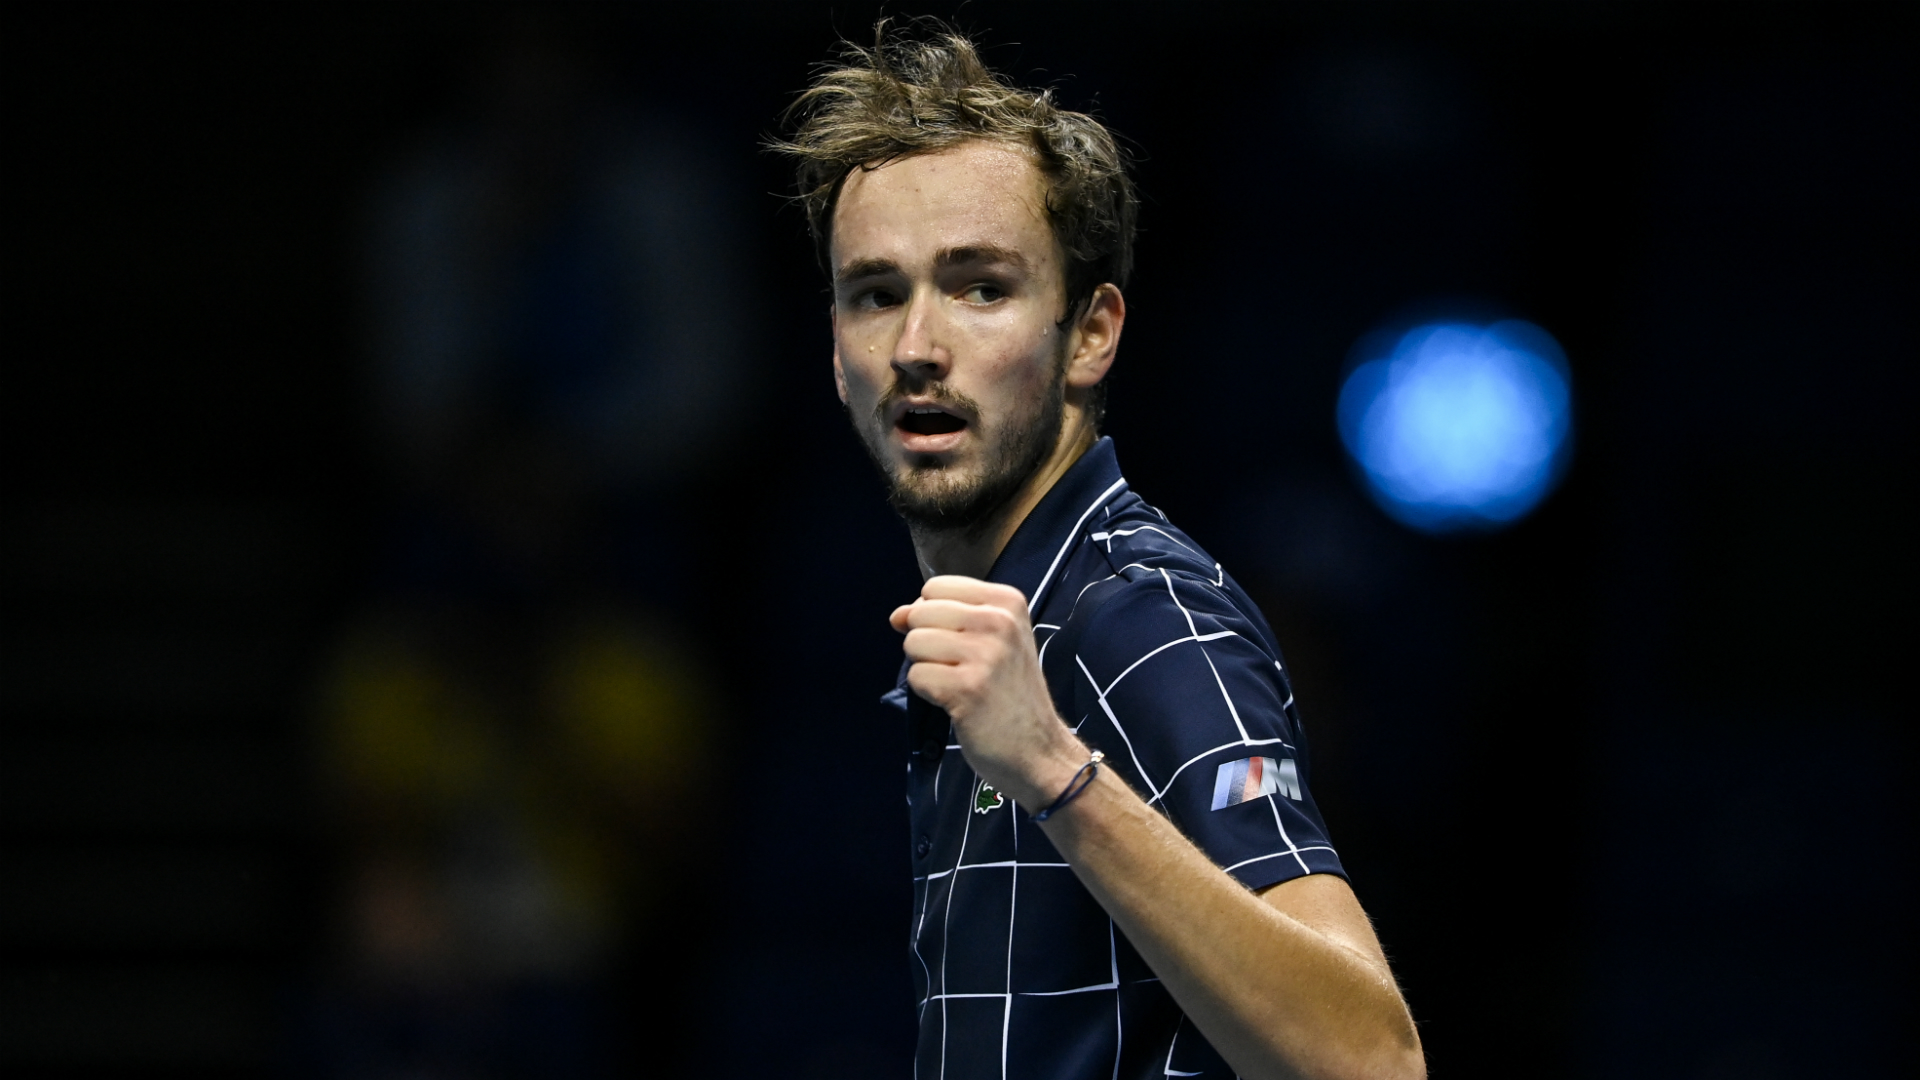 ATP Finals: Medvedev roars back to beat Thiem in thriller